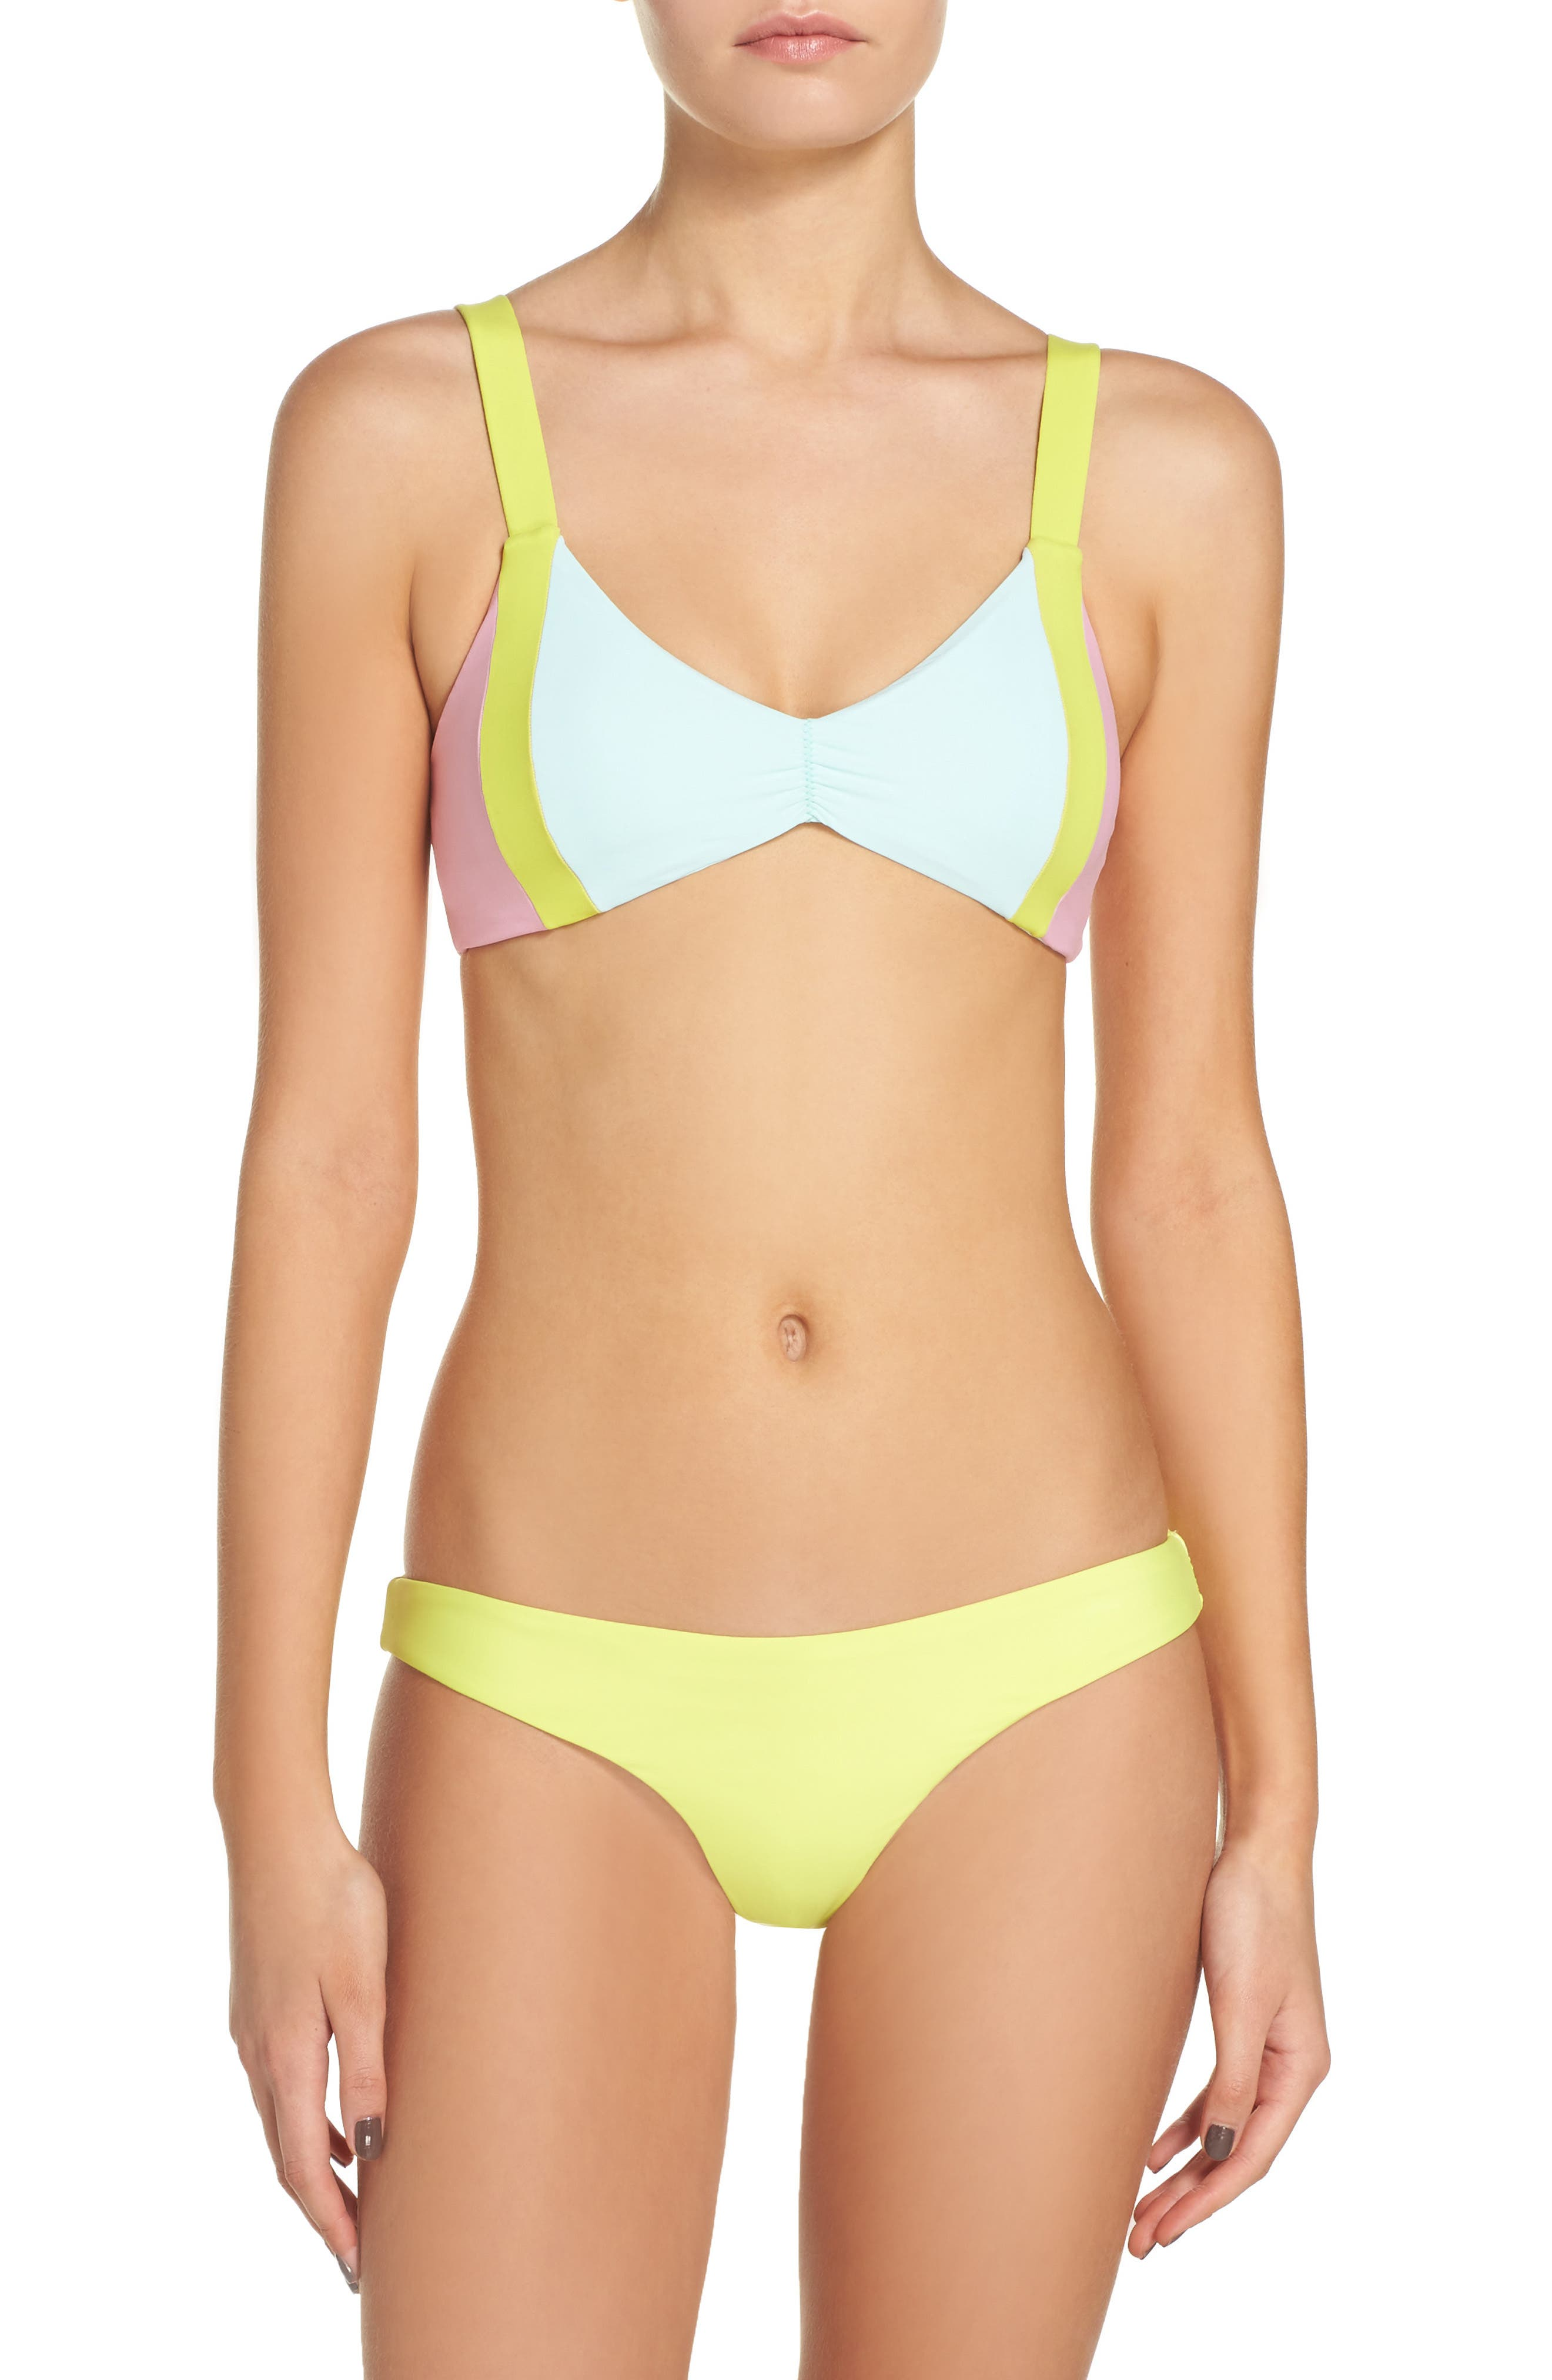 Sporty Utopia Bikini Top,                             Alternate thumbnail 6, color,                             Blue/ Green